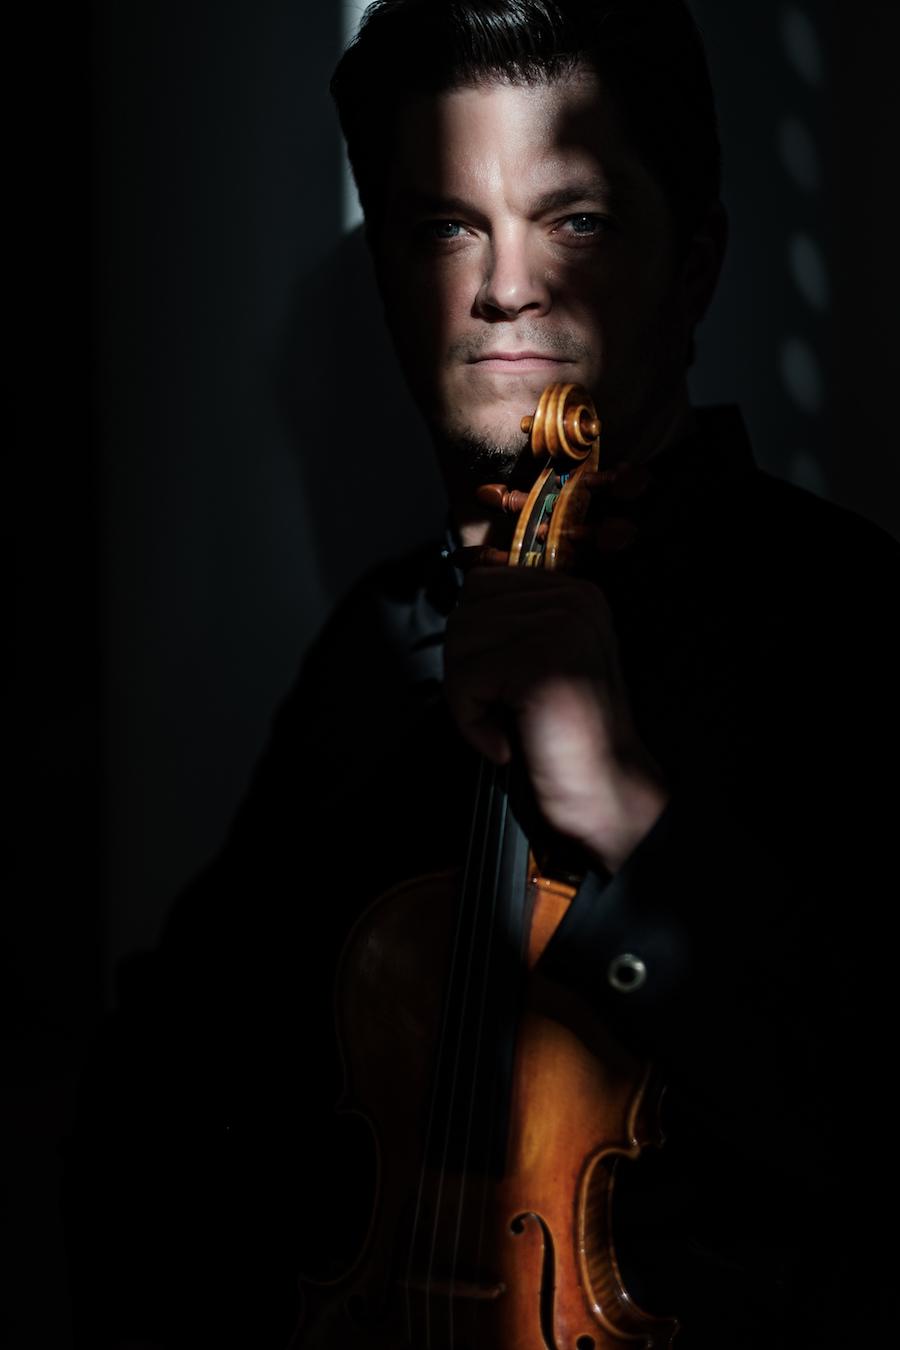 Fotoshooting Matthias Bruns Mischa Blank black and whit schwarzweiss Kammermusik Art Coaching Meisterkurse Masterclass